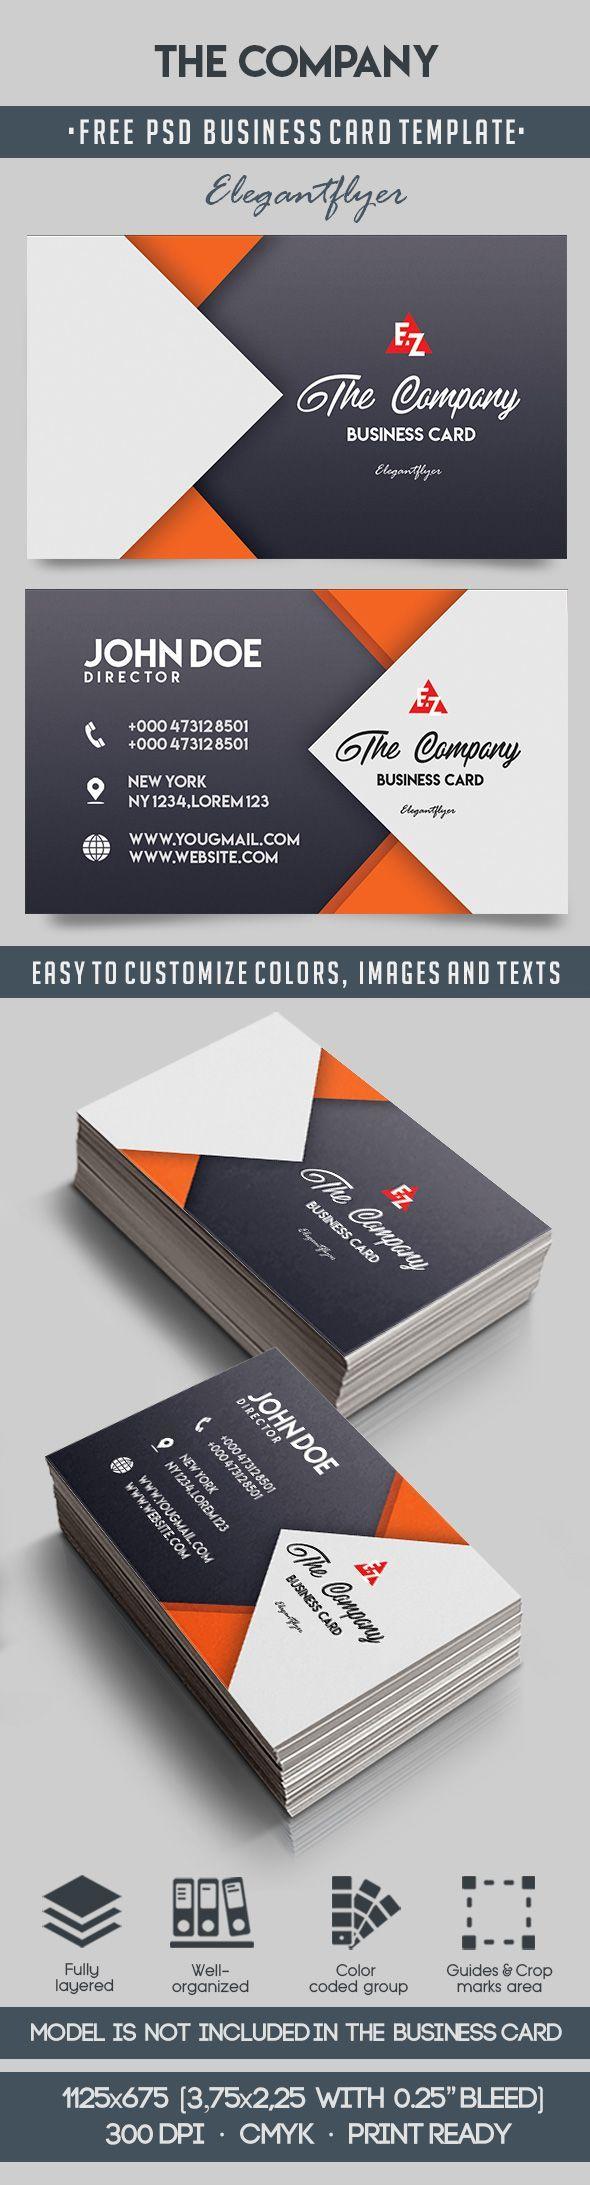 The Company u2013 Free Business Card Templates